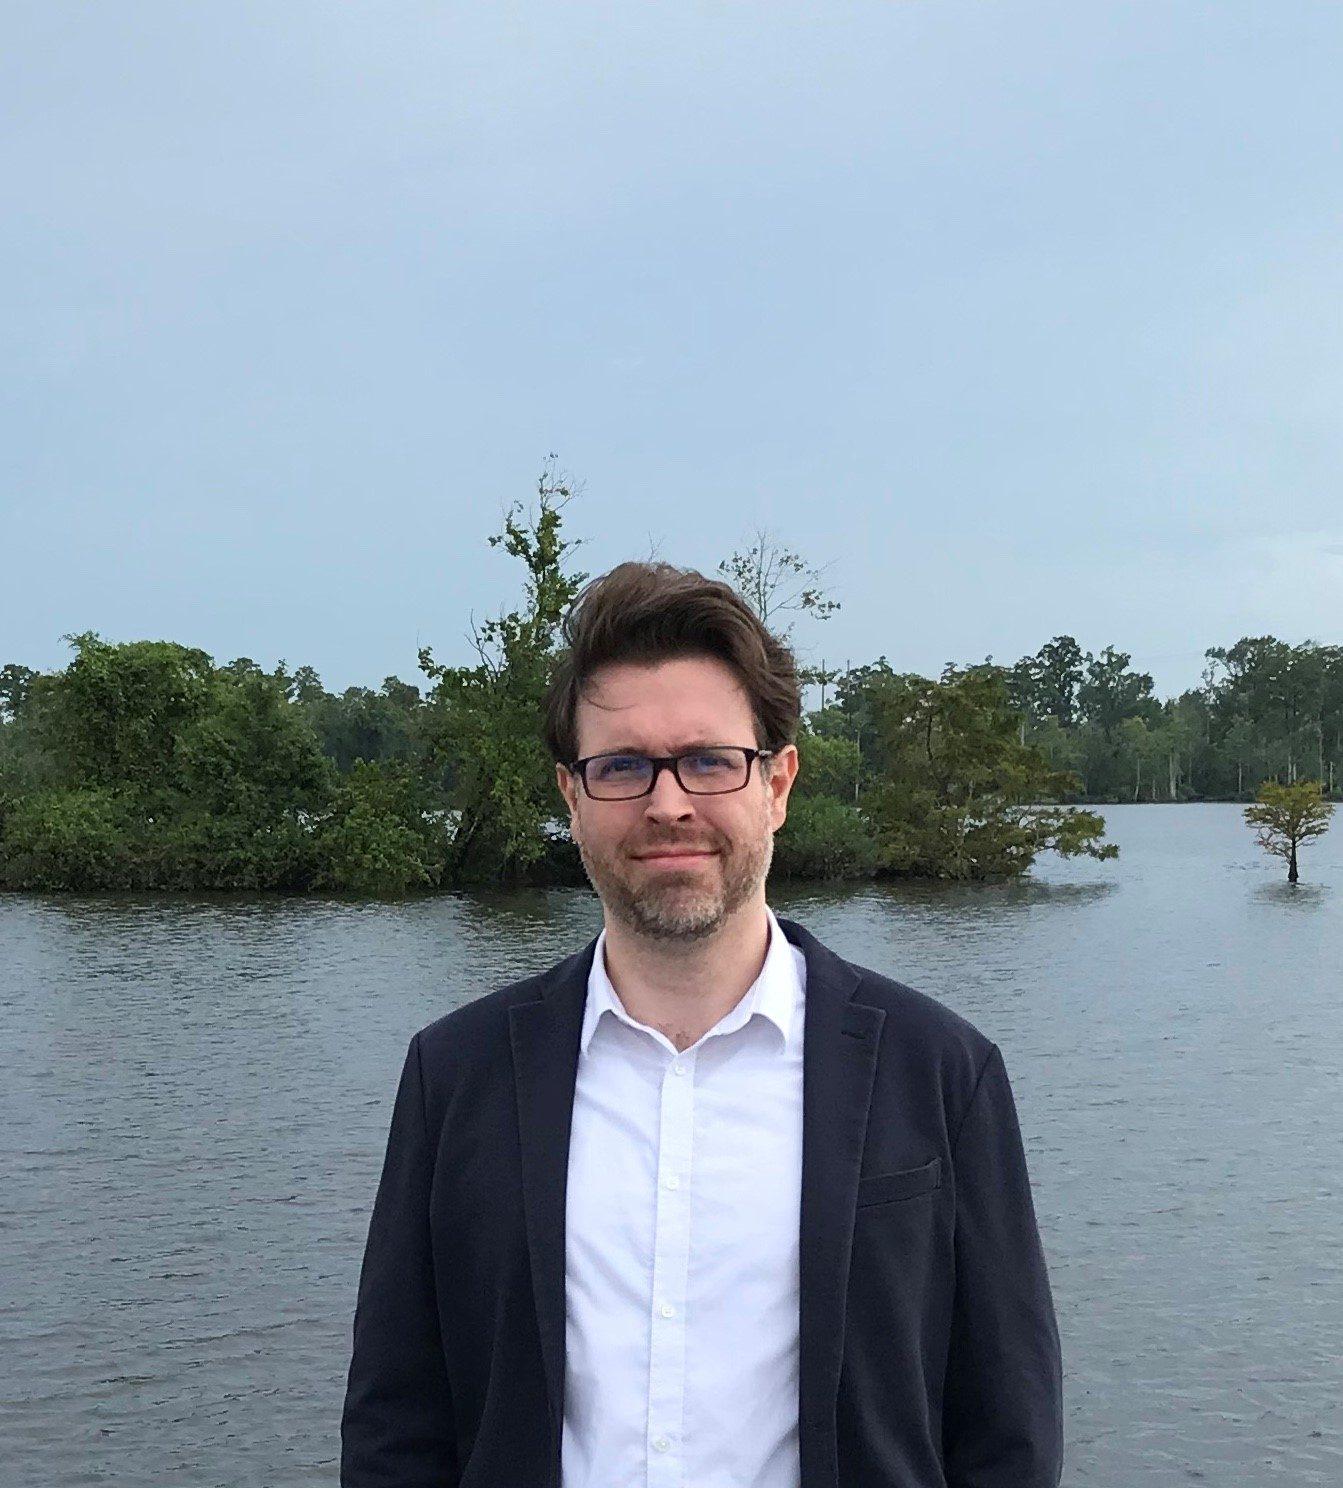 Jonathan Walston